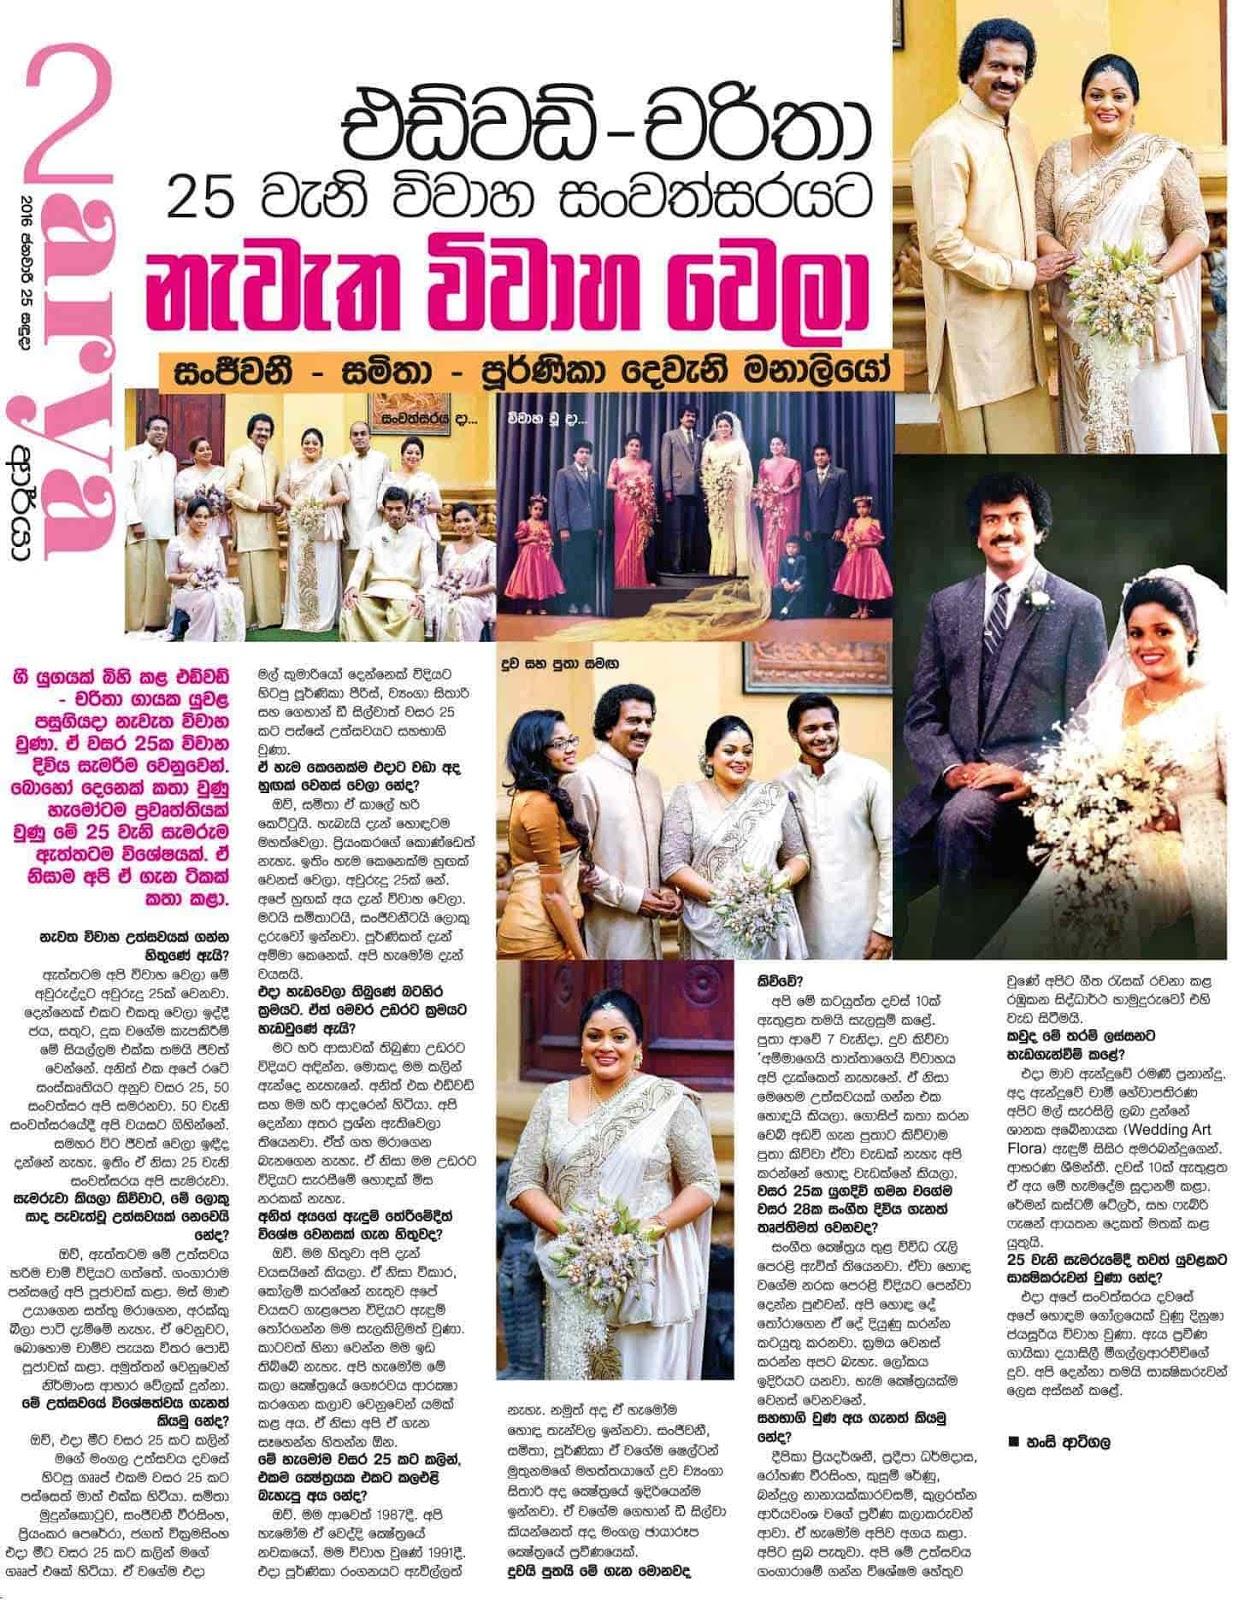 Edward Jayakody Charitha Priyadarshani 25 Wedding Anniversary